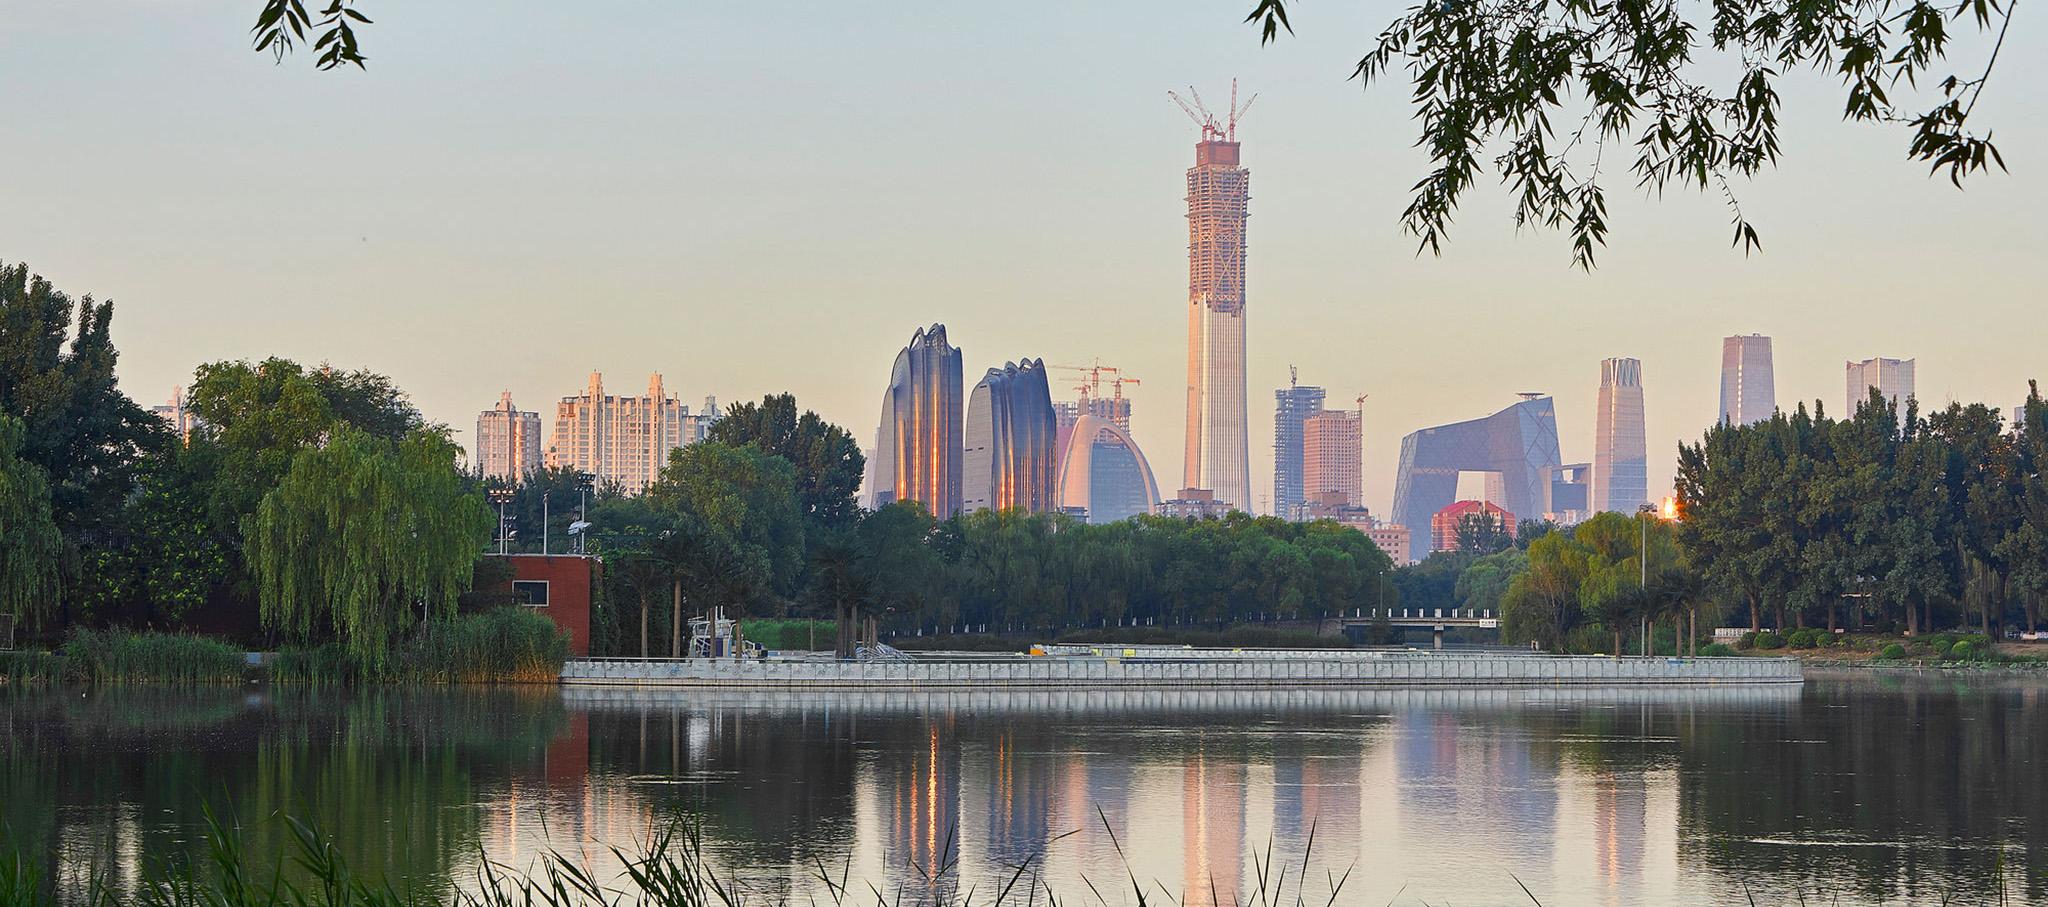 Chaoyang Park Plaza en Pekín por MAD Architects. Fotografía © Hufton+Crow